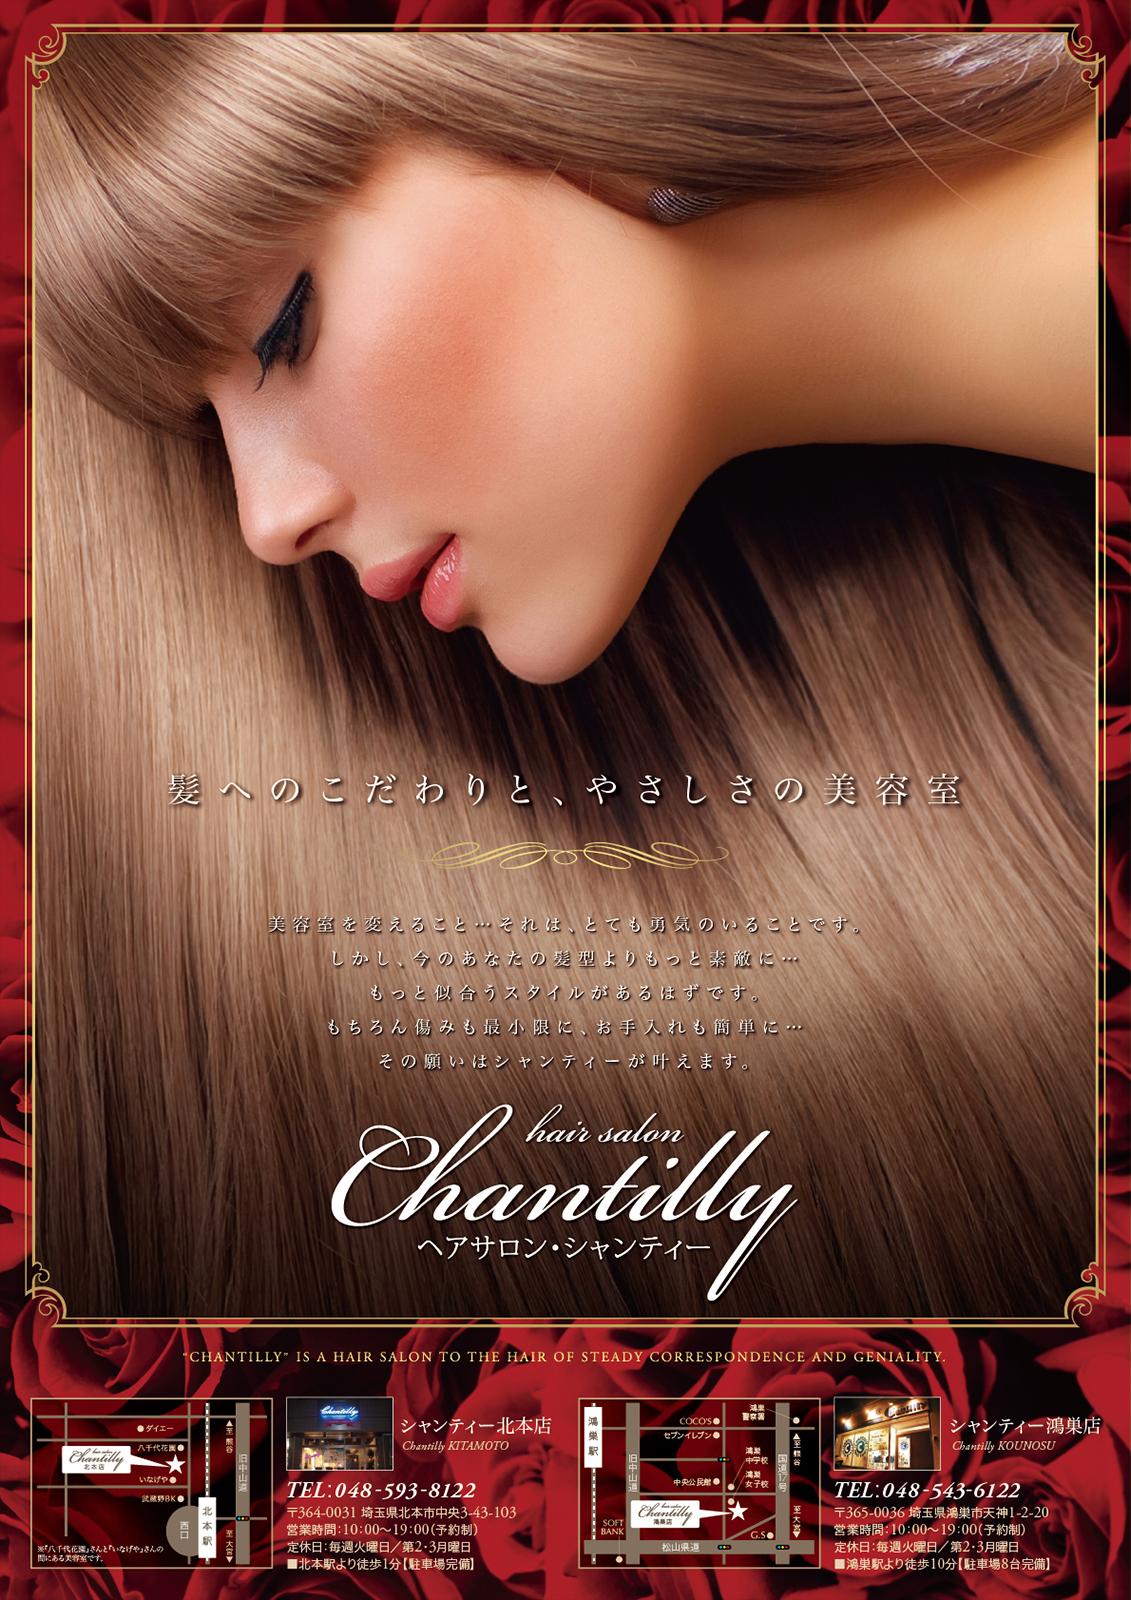 美容室『Chantilly』様・A4両面チラシ2